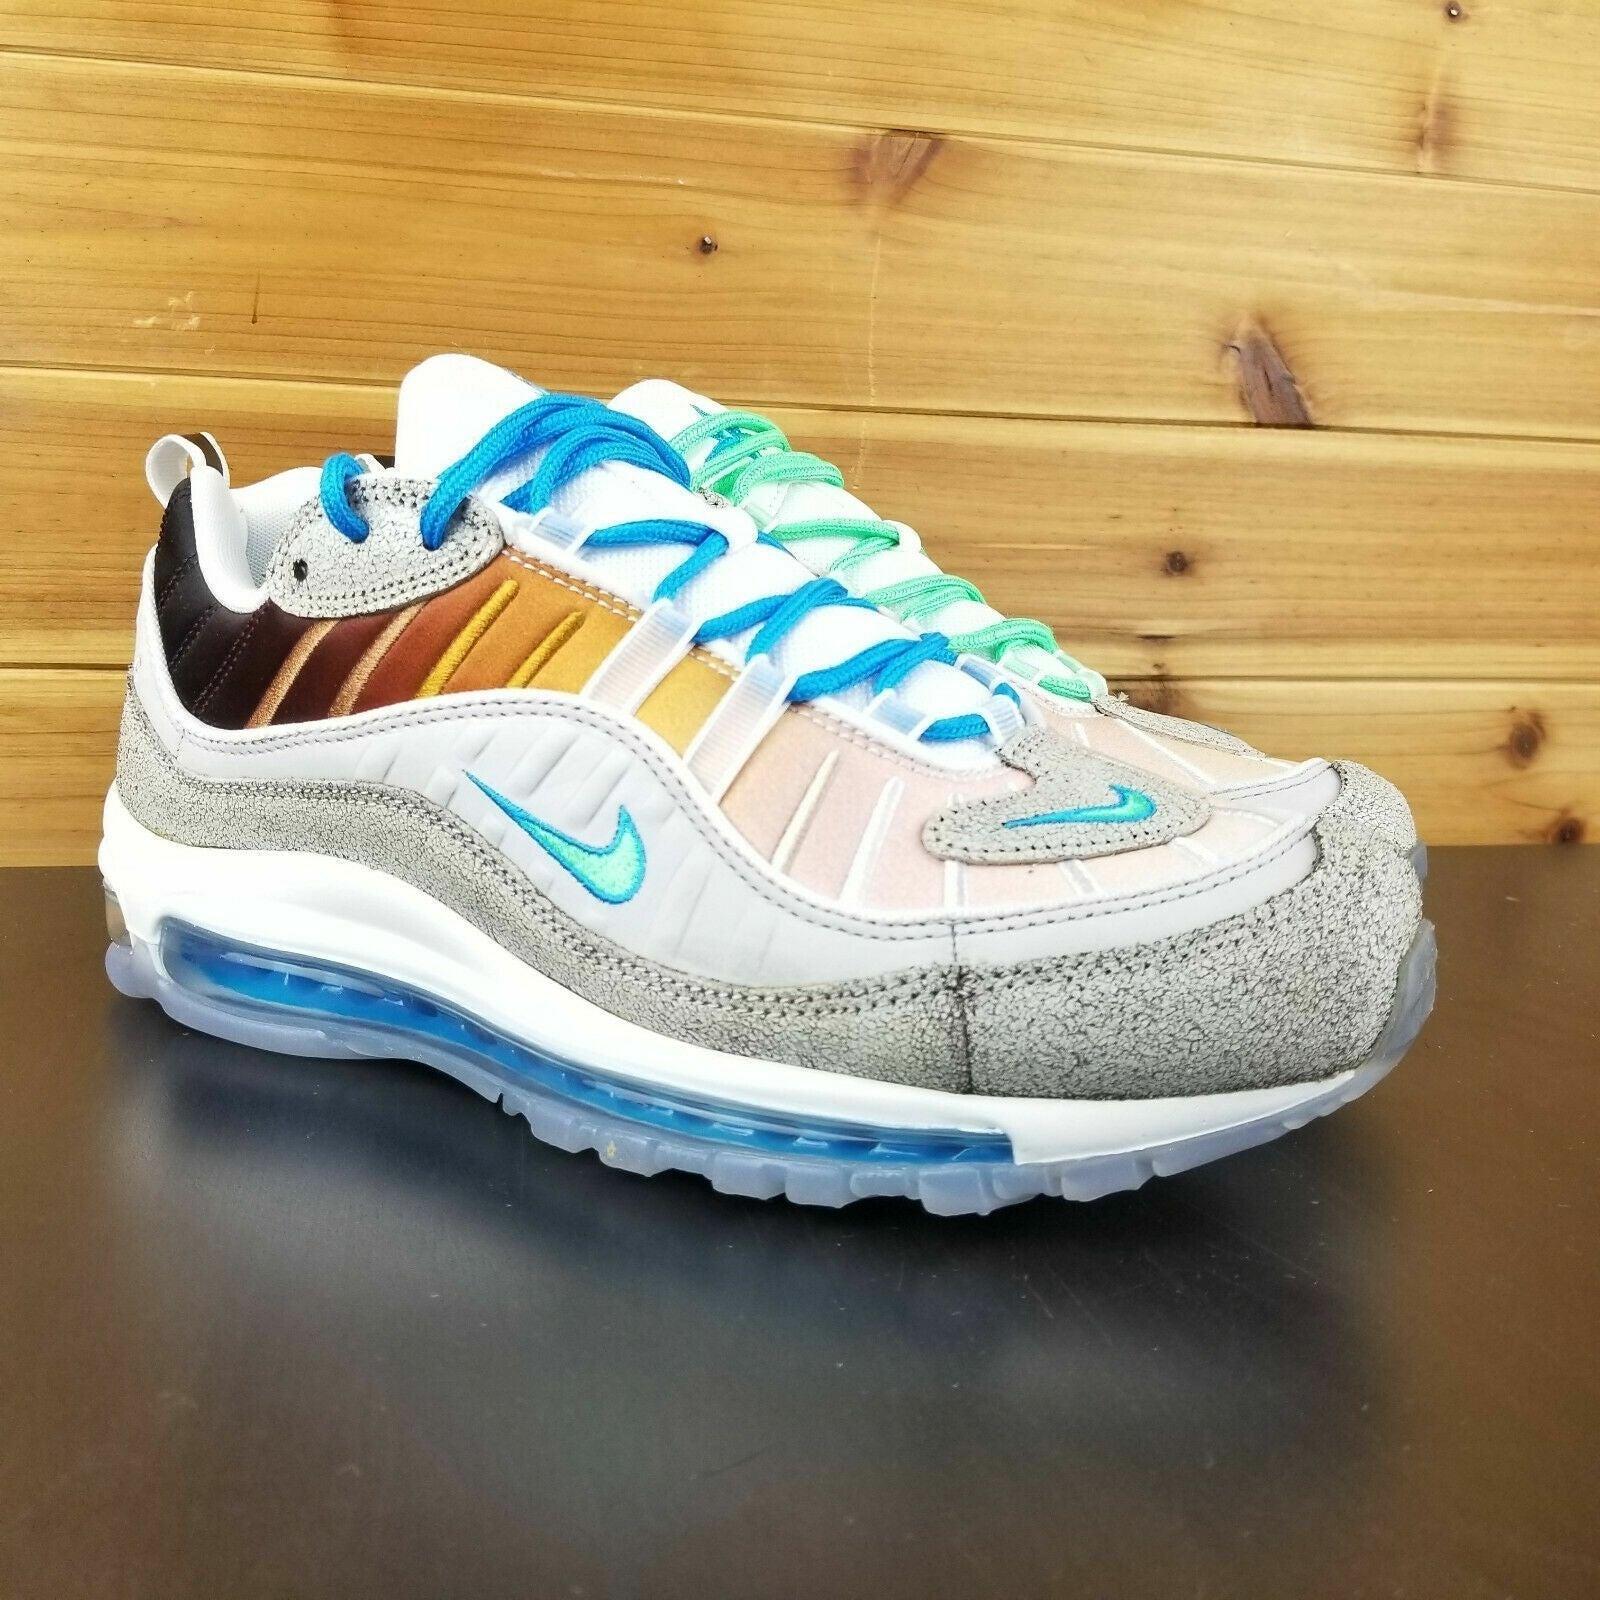 Nike Air 98 La Mezcla size 11.5